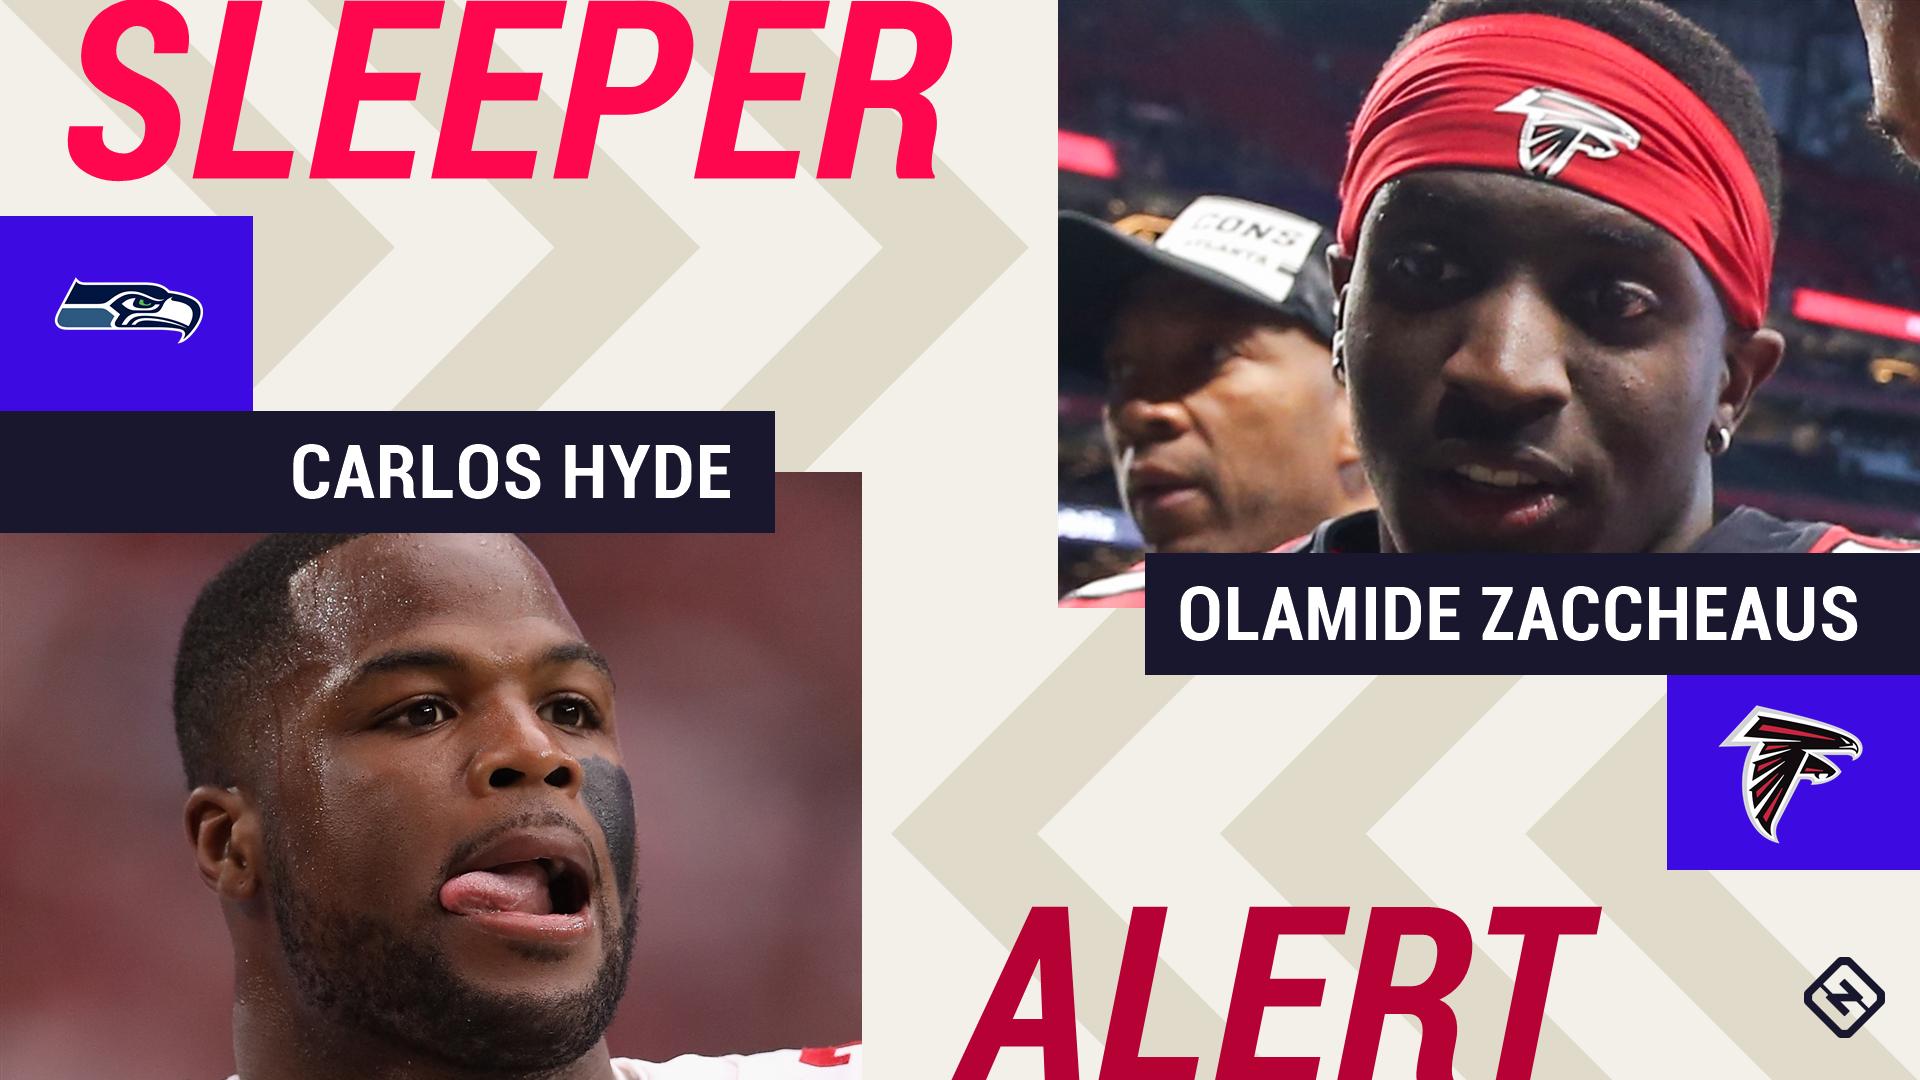 Week 4 Fantasy Sleepers: Injuries to Chris Carson, Julio Jones make Carlos Hyde, Olamide Zaccheaus potential starters